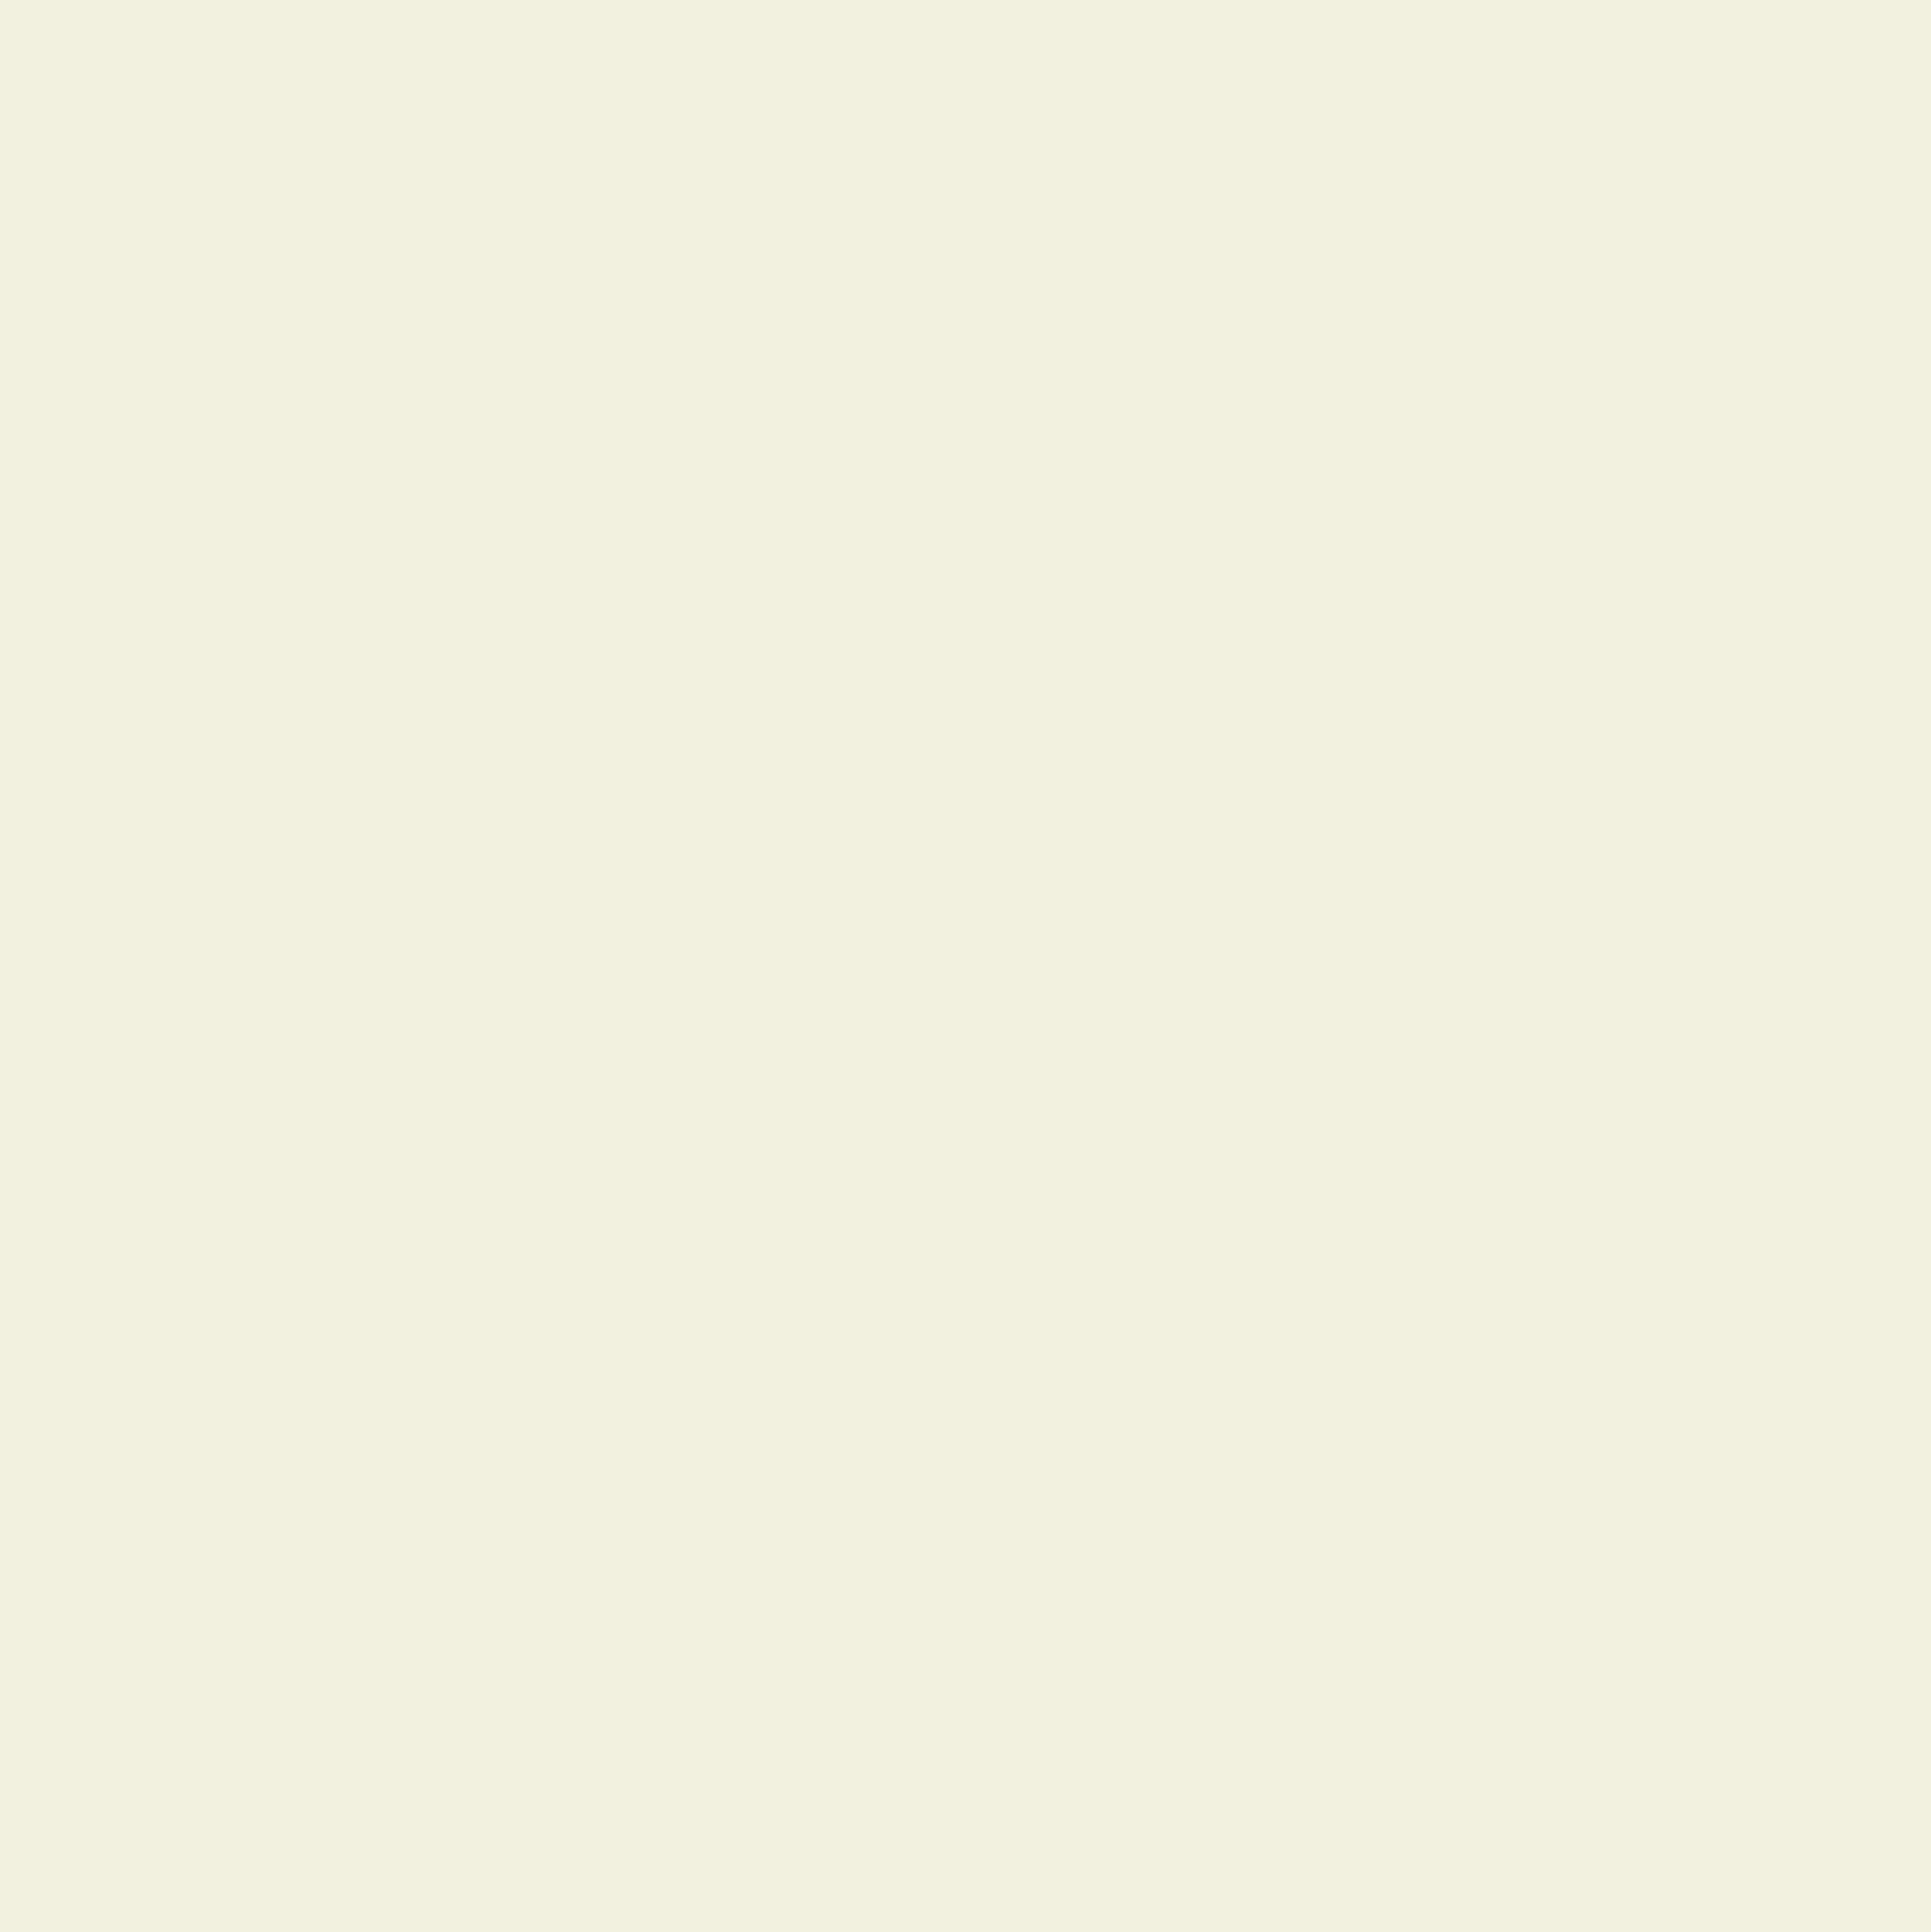 Mantel CRUDOColorLiso Rectangular 1,5x2,1m [retirooenvíoen 5·7díashábiles]